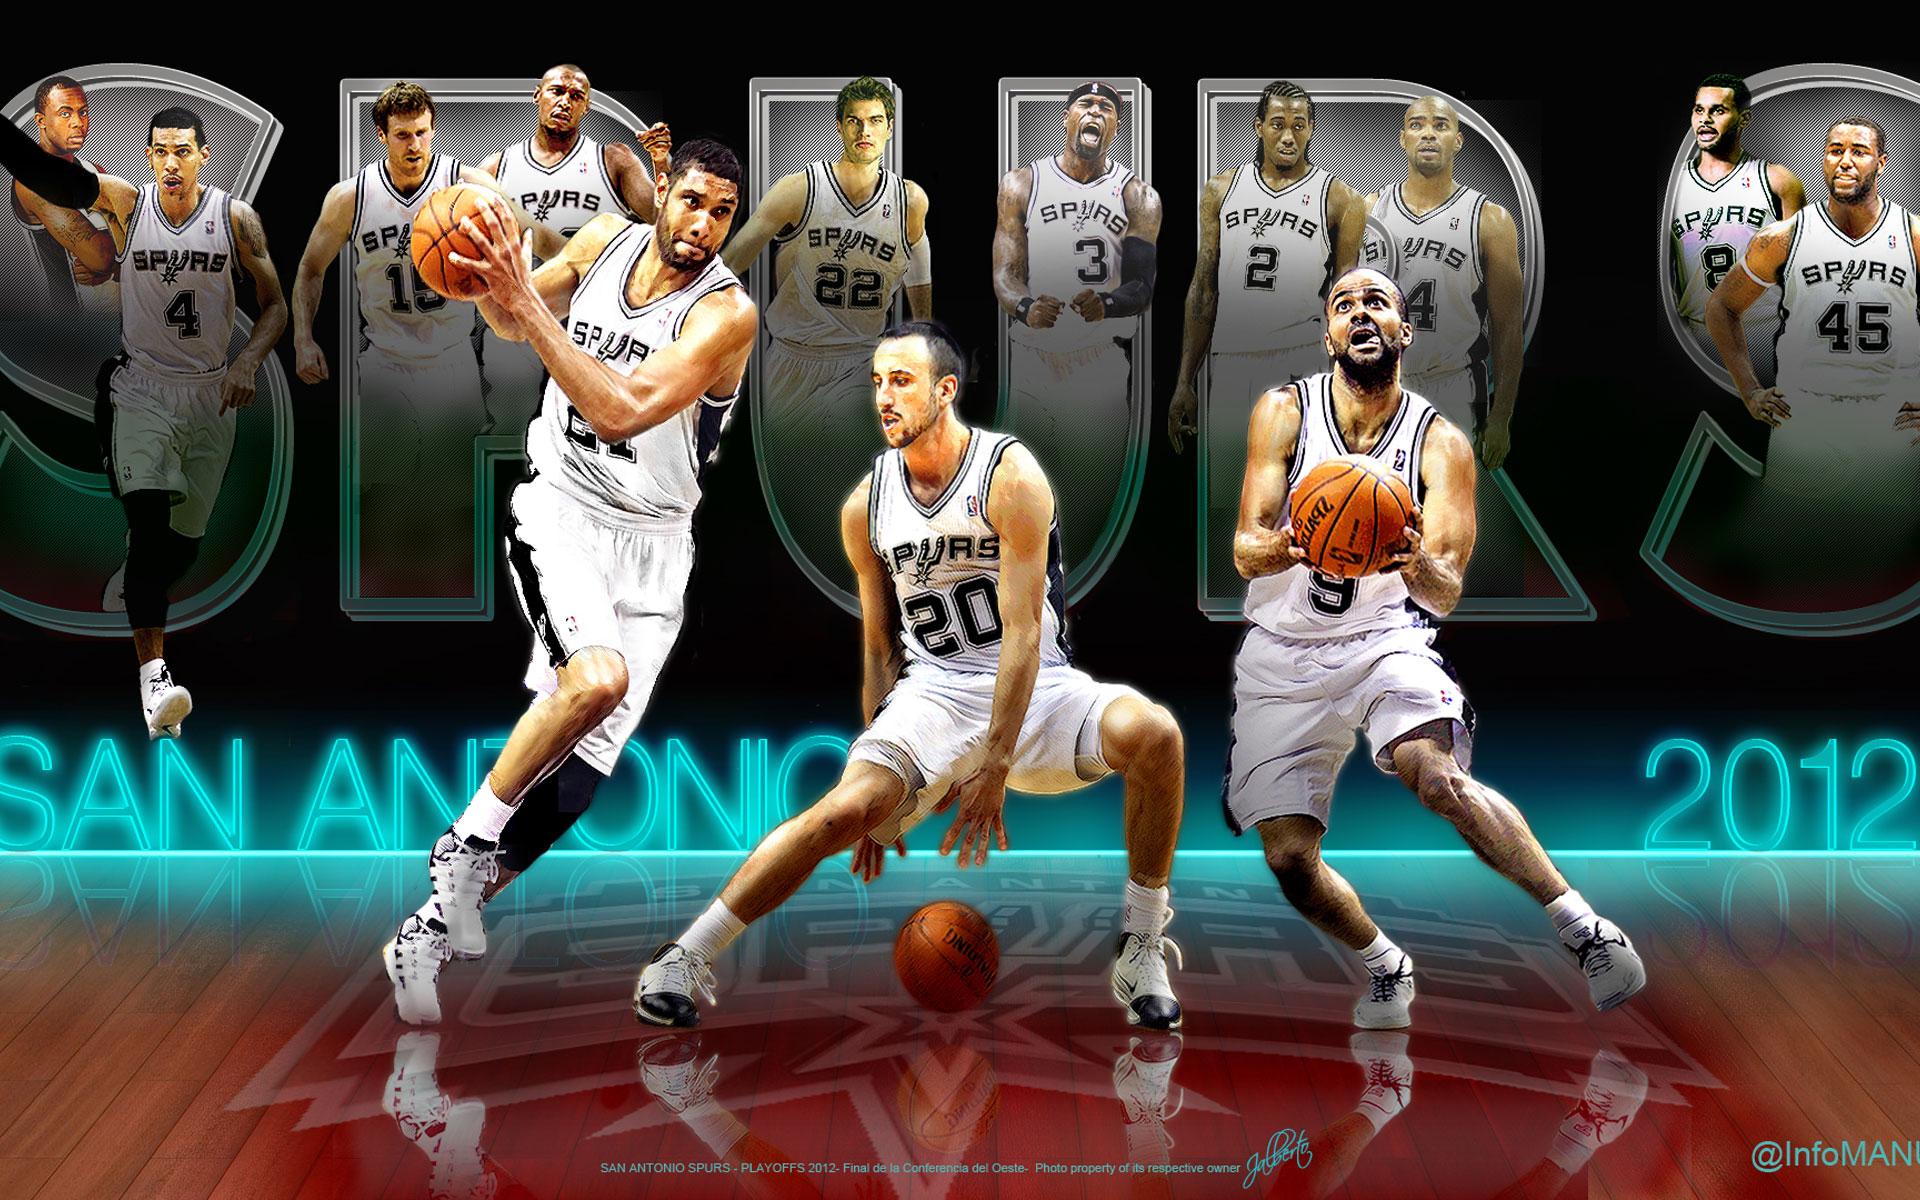 46 Free San Antonio Spurs Wallpaper On Wallpapersafari